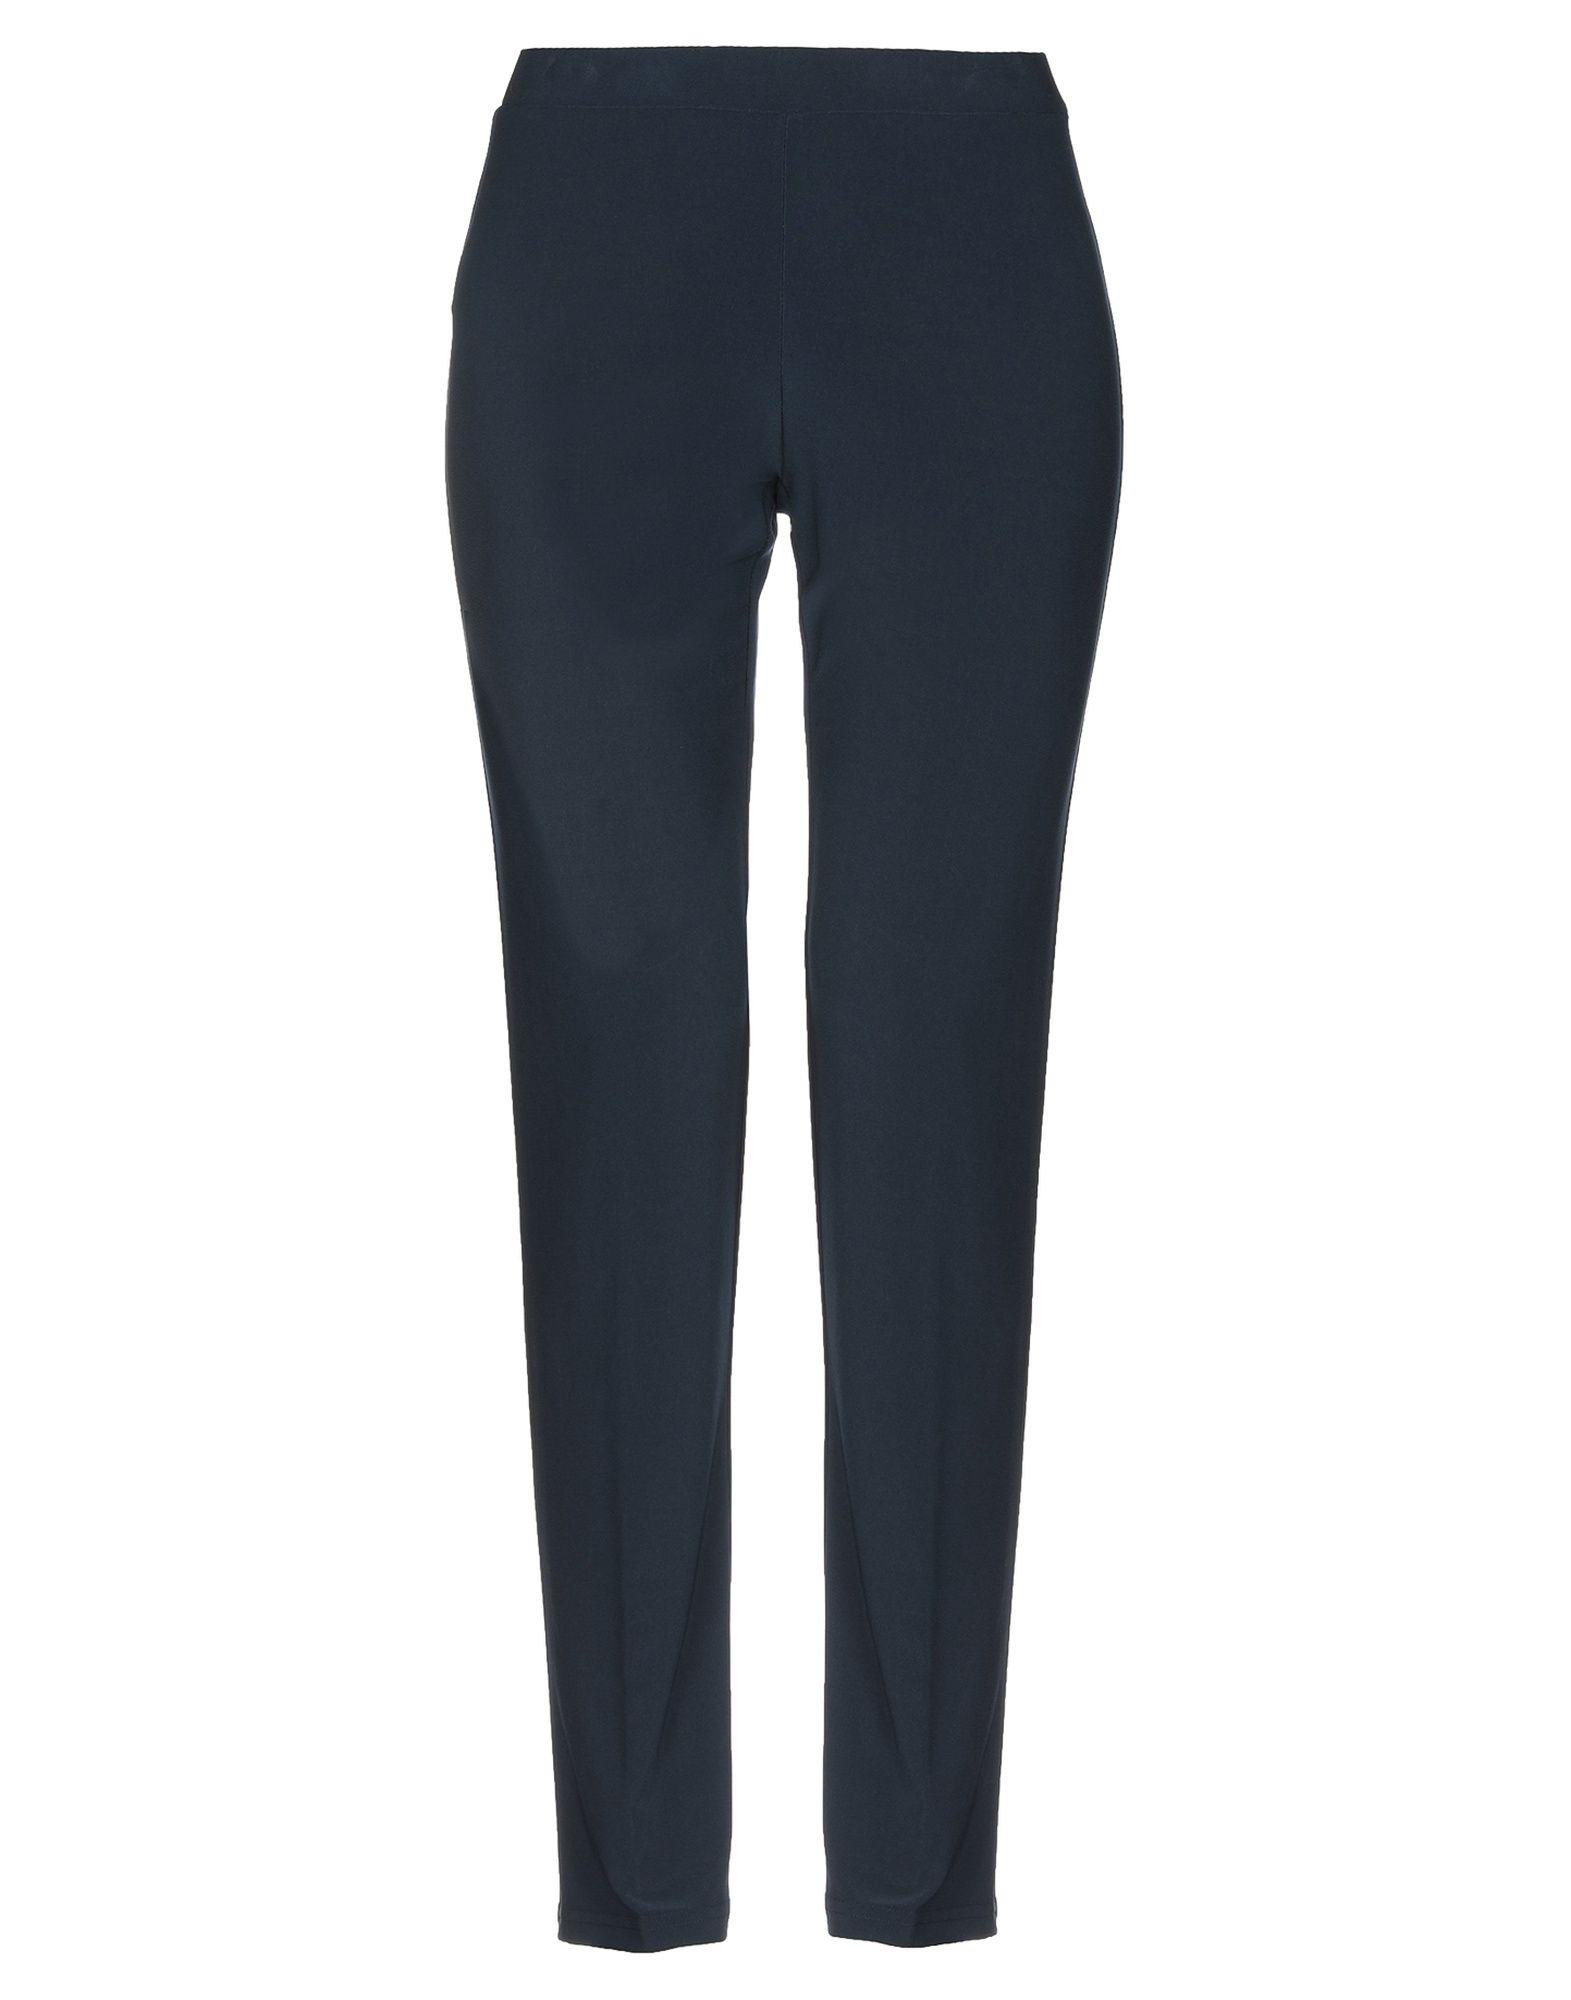 VIA STENDHAL Roma Повседневные брюки via stendhal roma джинсовые брюки